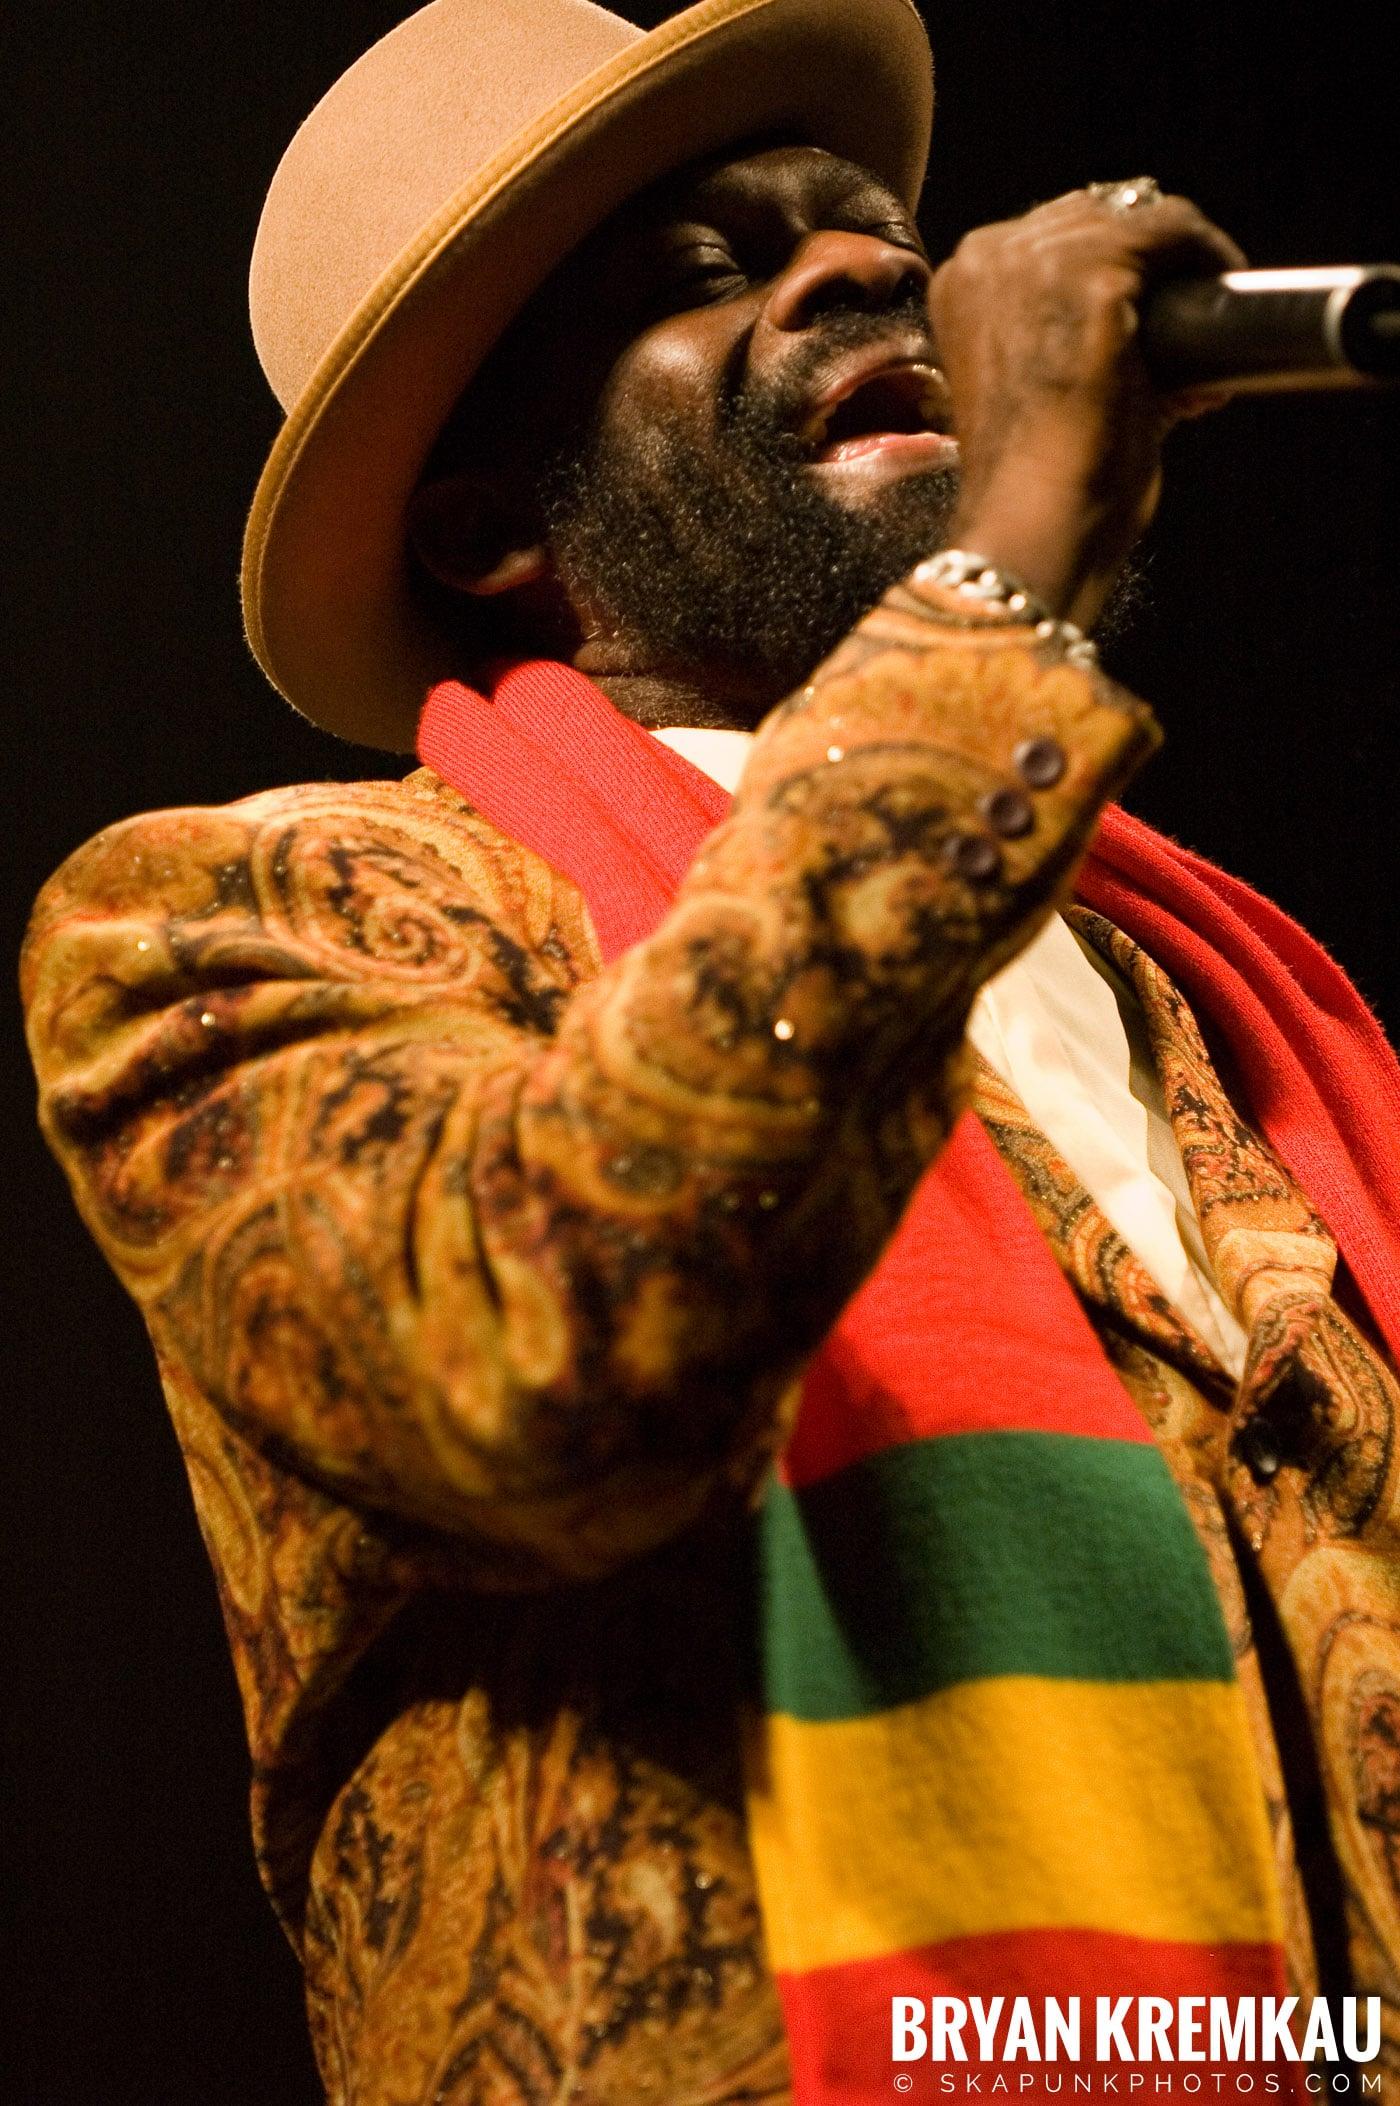 Jimmy Riley @ Vintage Reggae Fest - Hammerstein Ballroom, NYC - 12.16.07 (8)